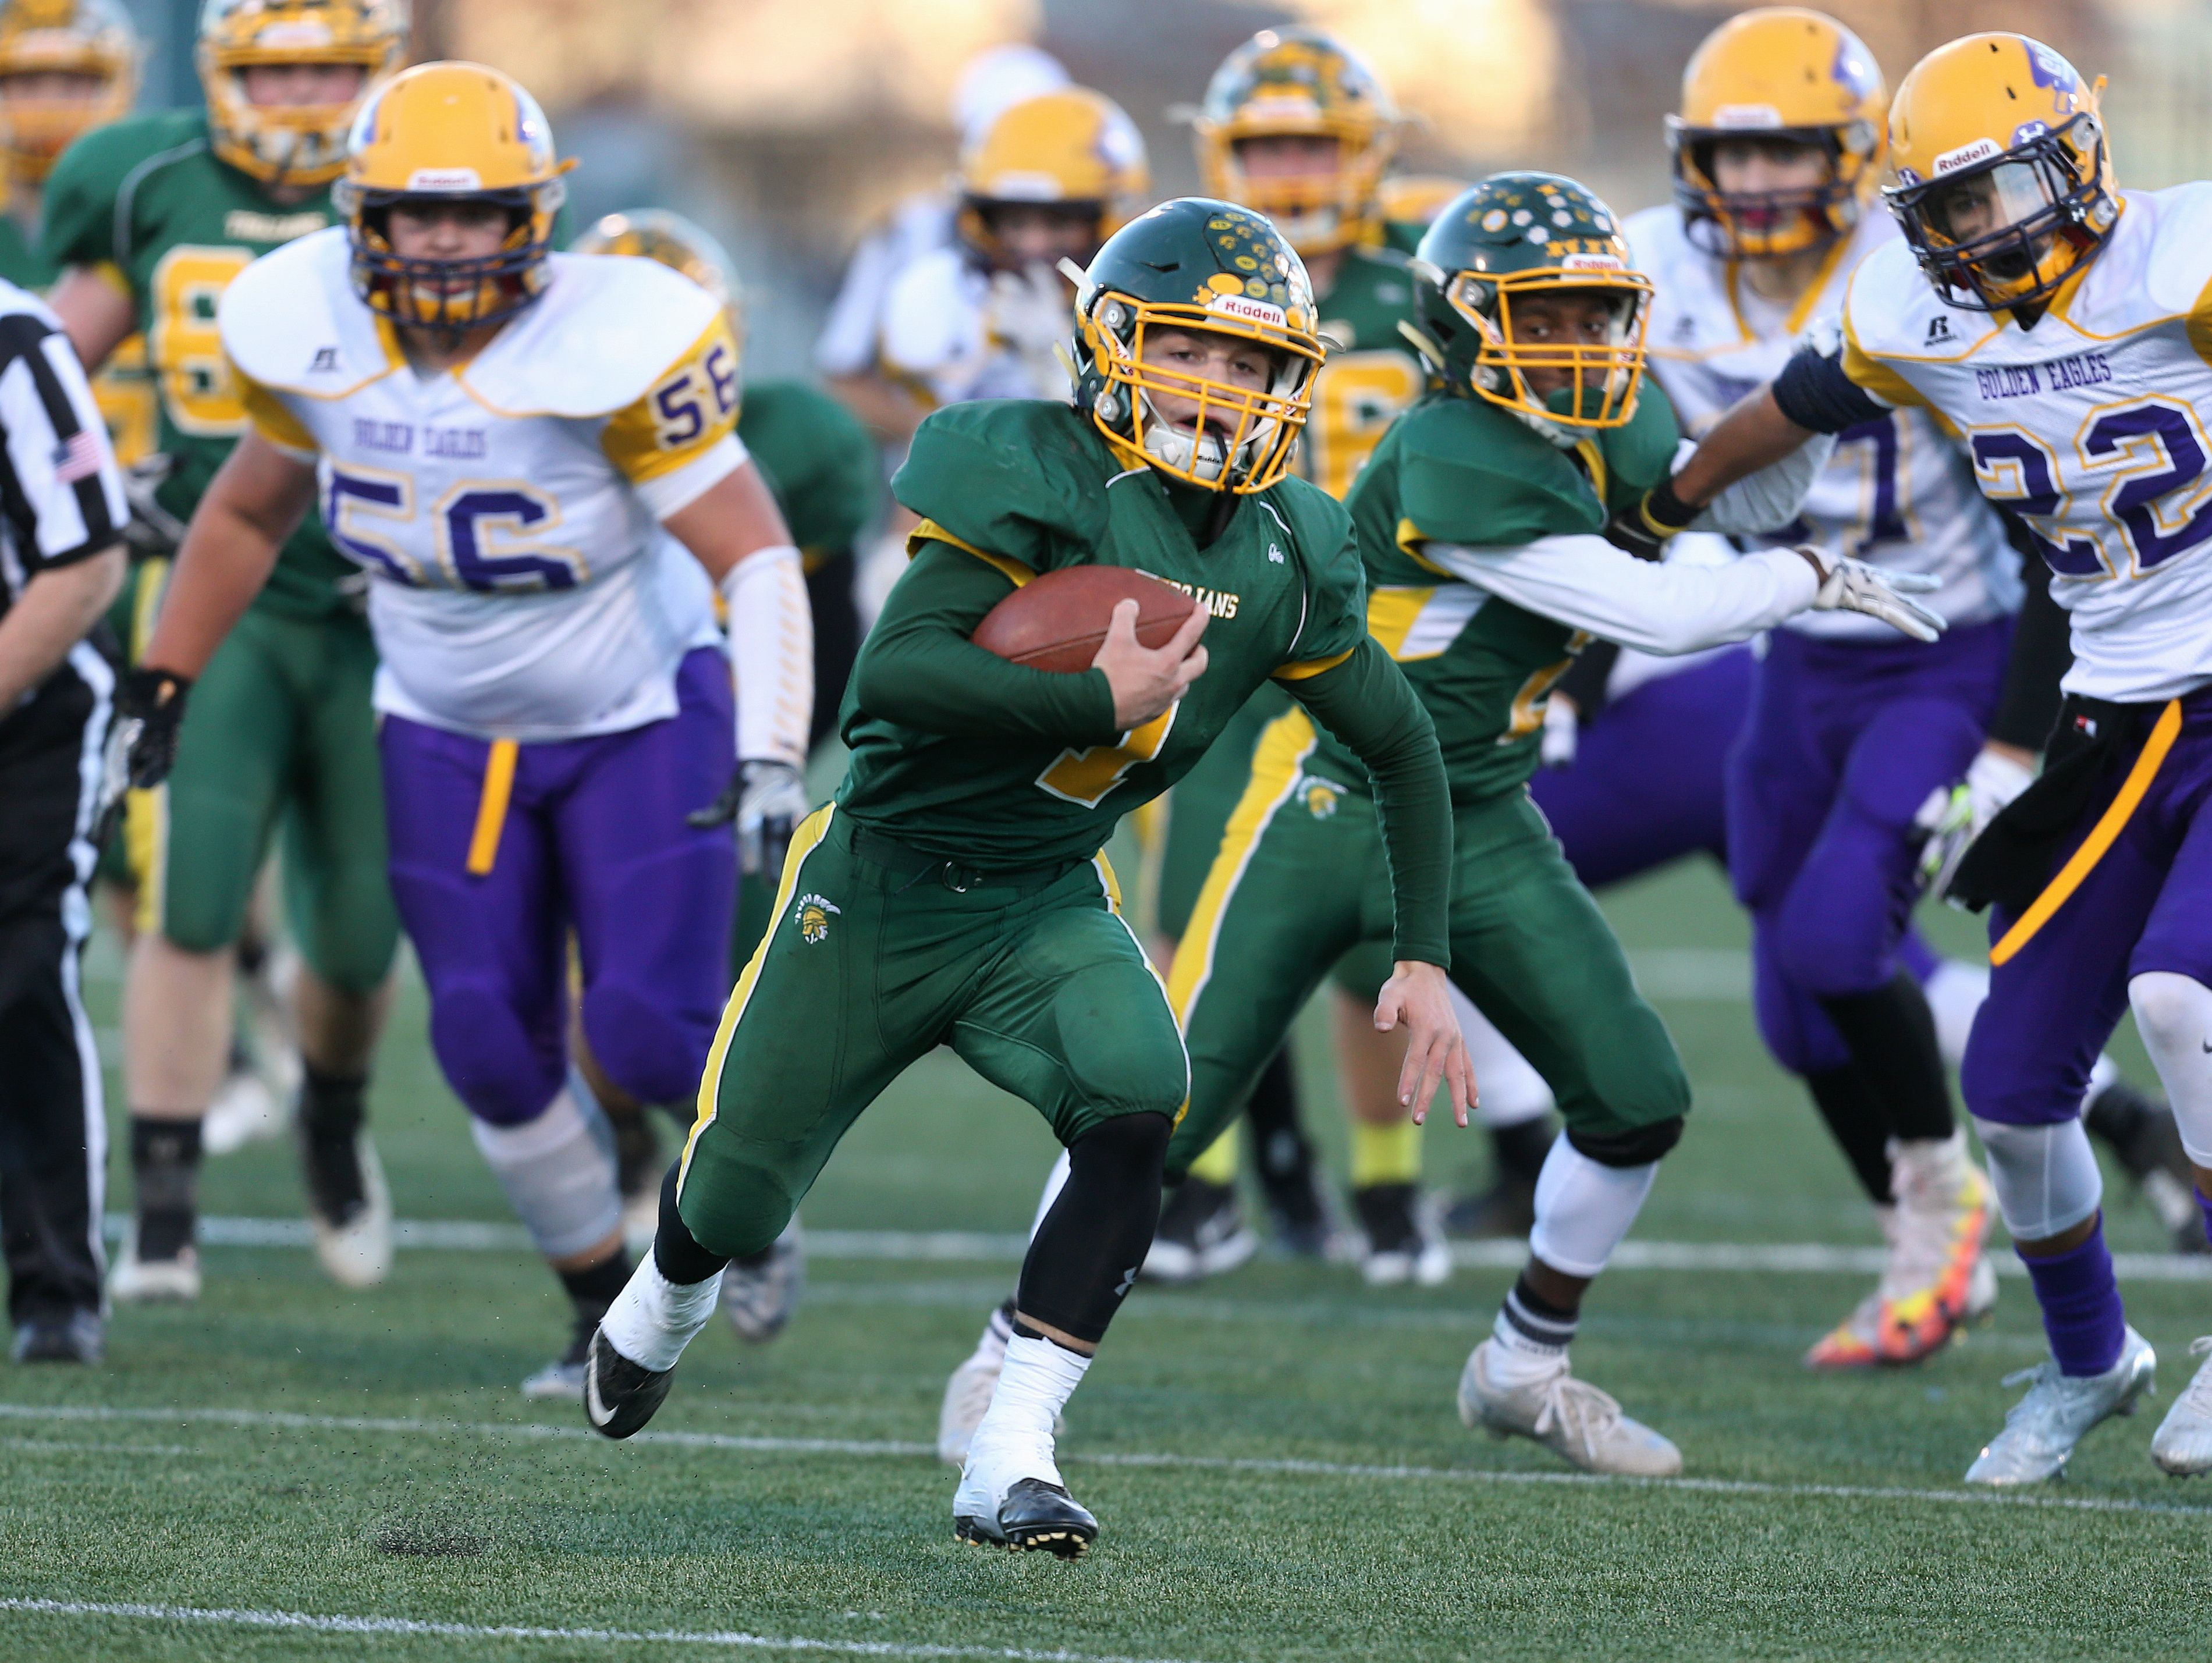 Alexander running back Dane Heberlein breaks through the Clyde-Savannah defensive line.